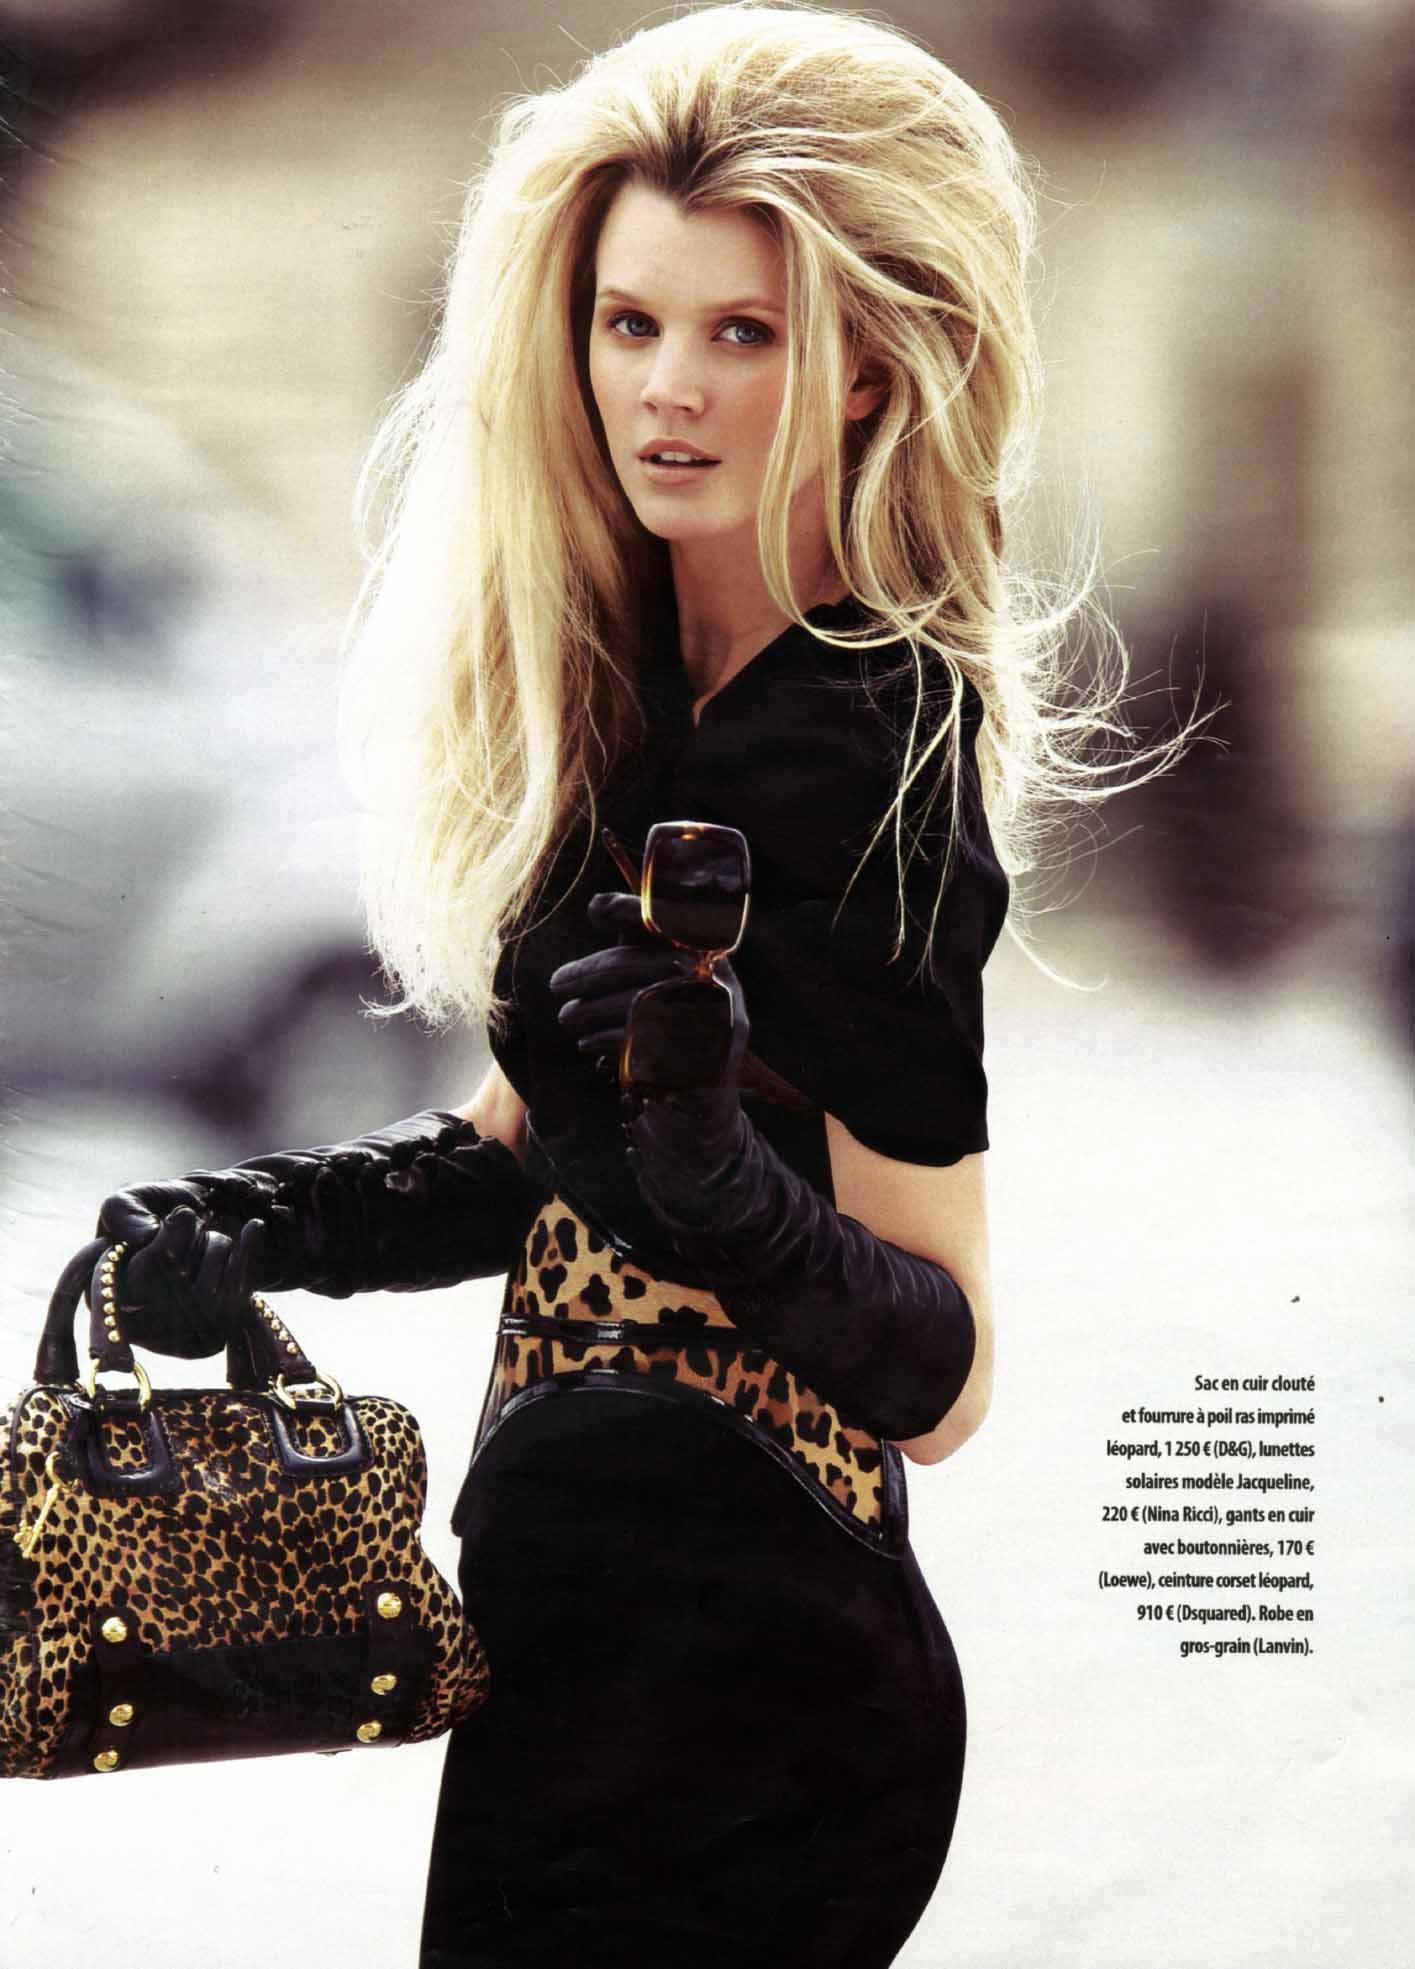 A Mode Magazine Paris Model Jayne Moore writer Jayne moore amazing hair donatela versace suit running through paris